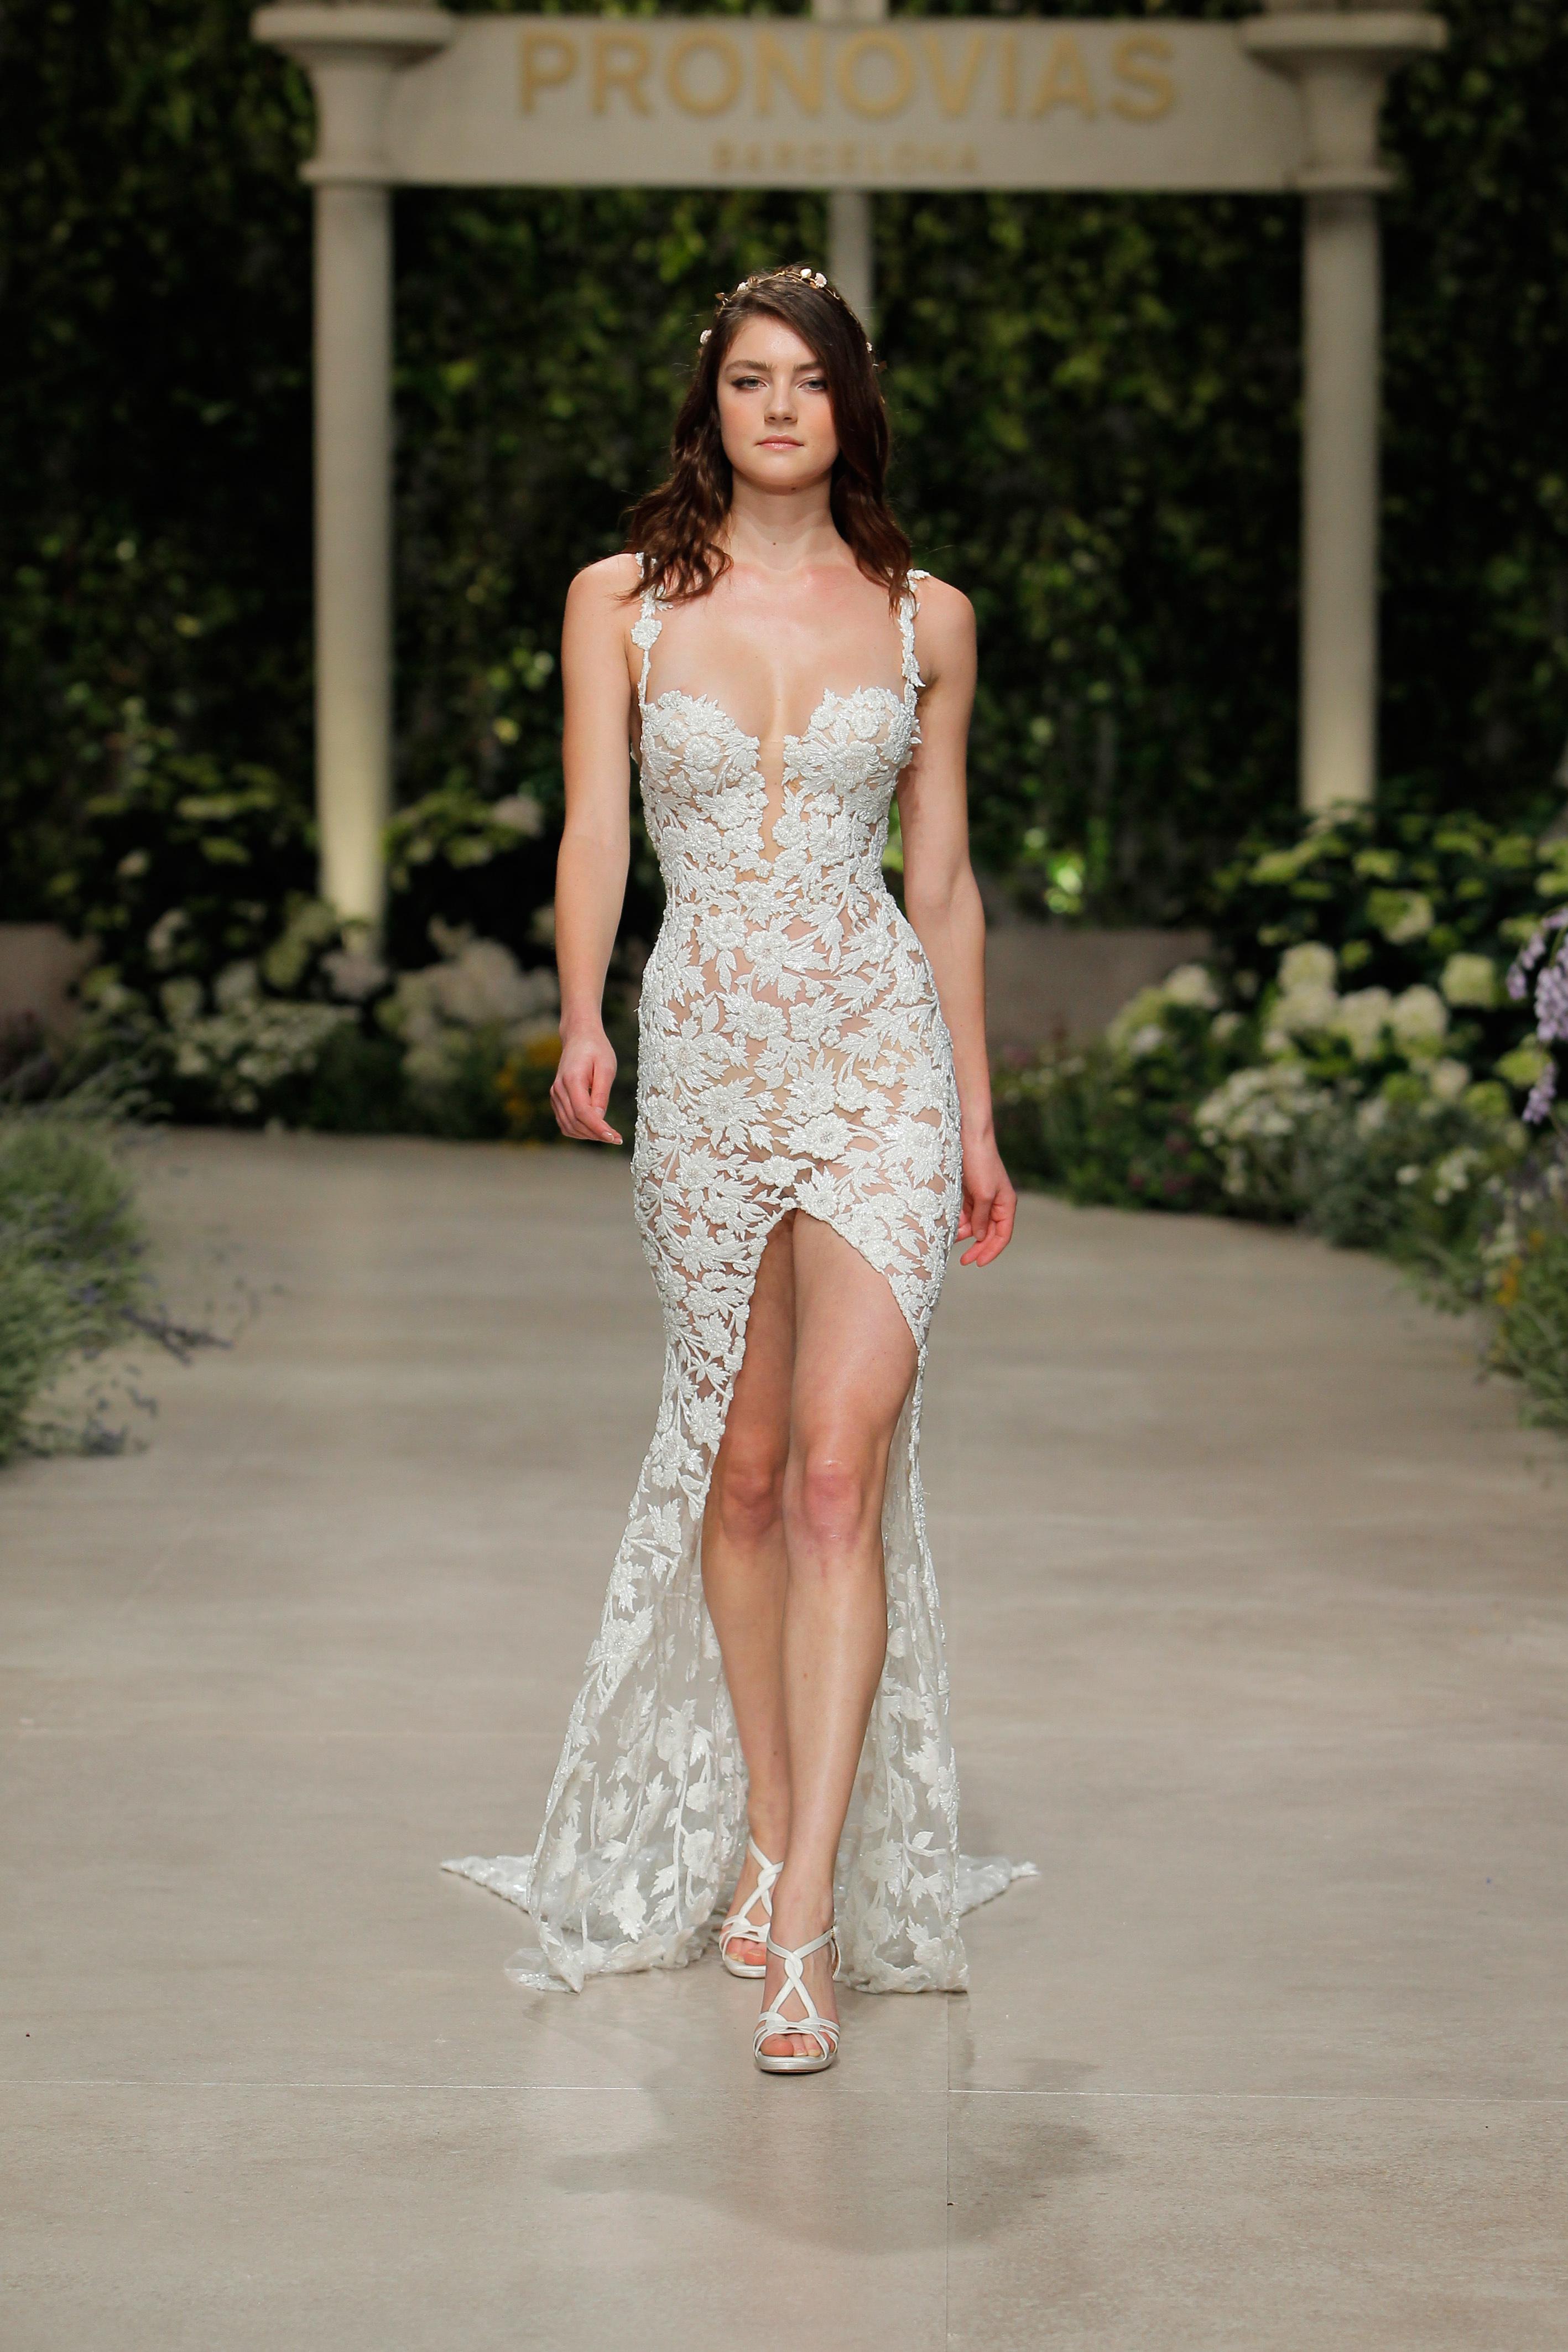 pronovias wedding dress spring 2019 lace sweetheart front slit